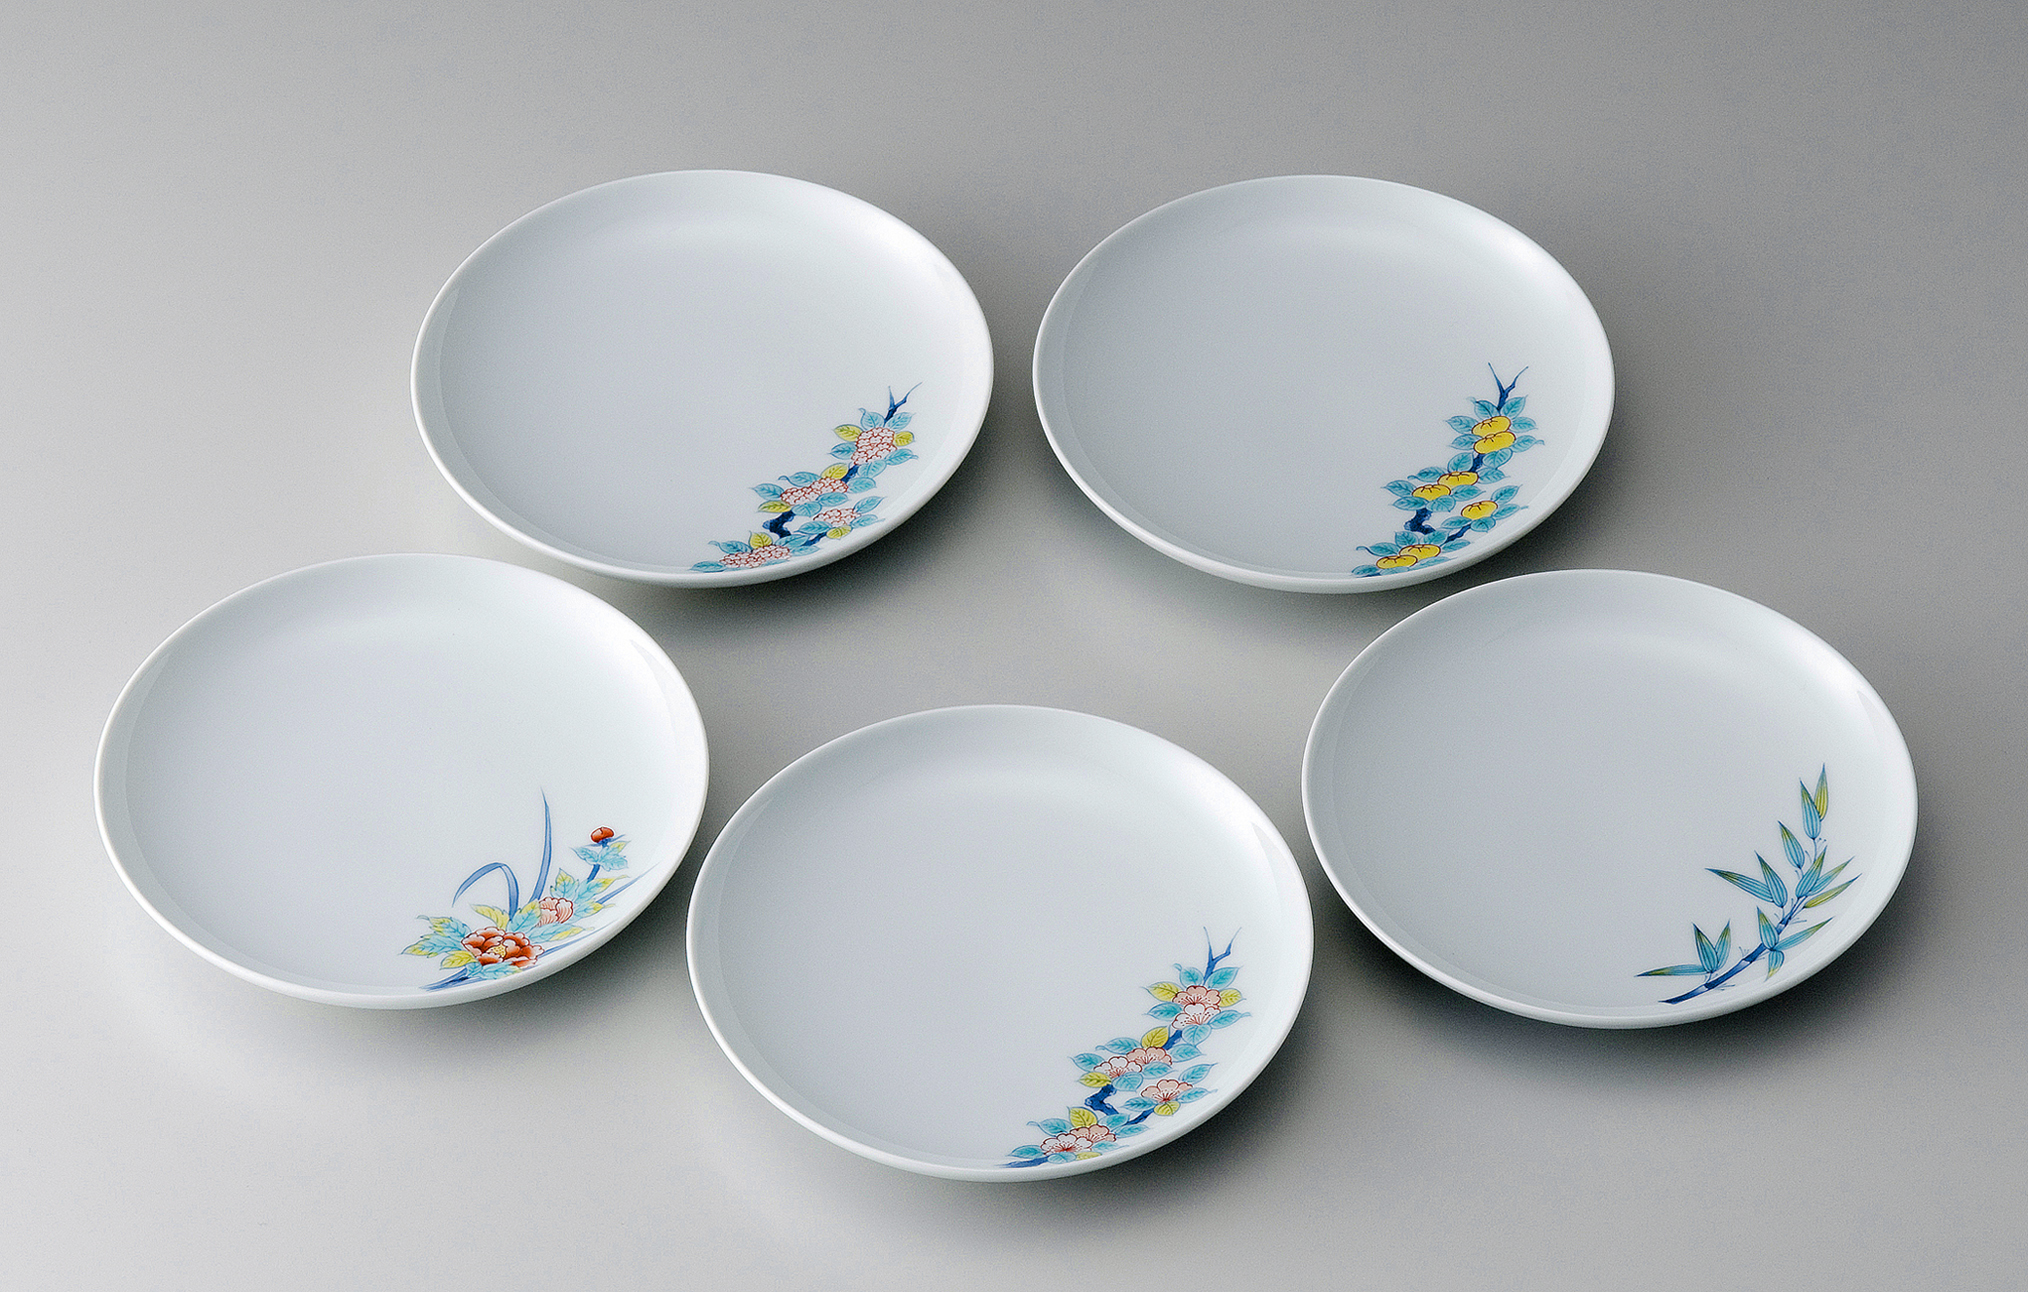 19cm和皿-鍋島五種絵変り